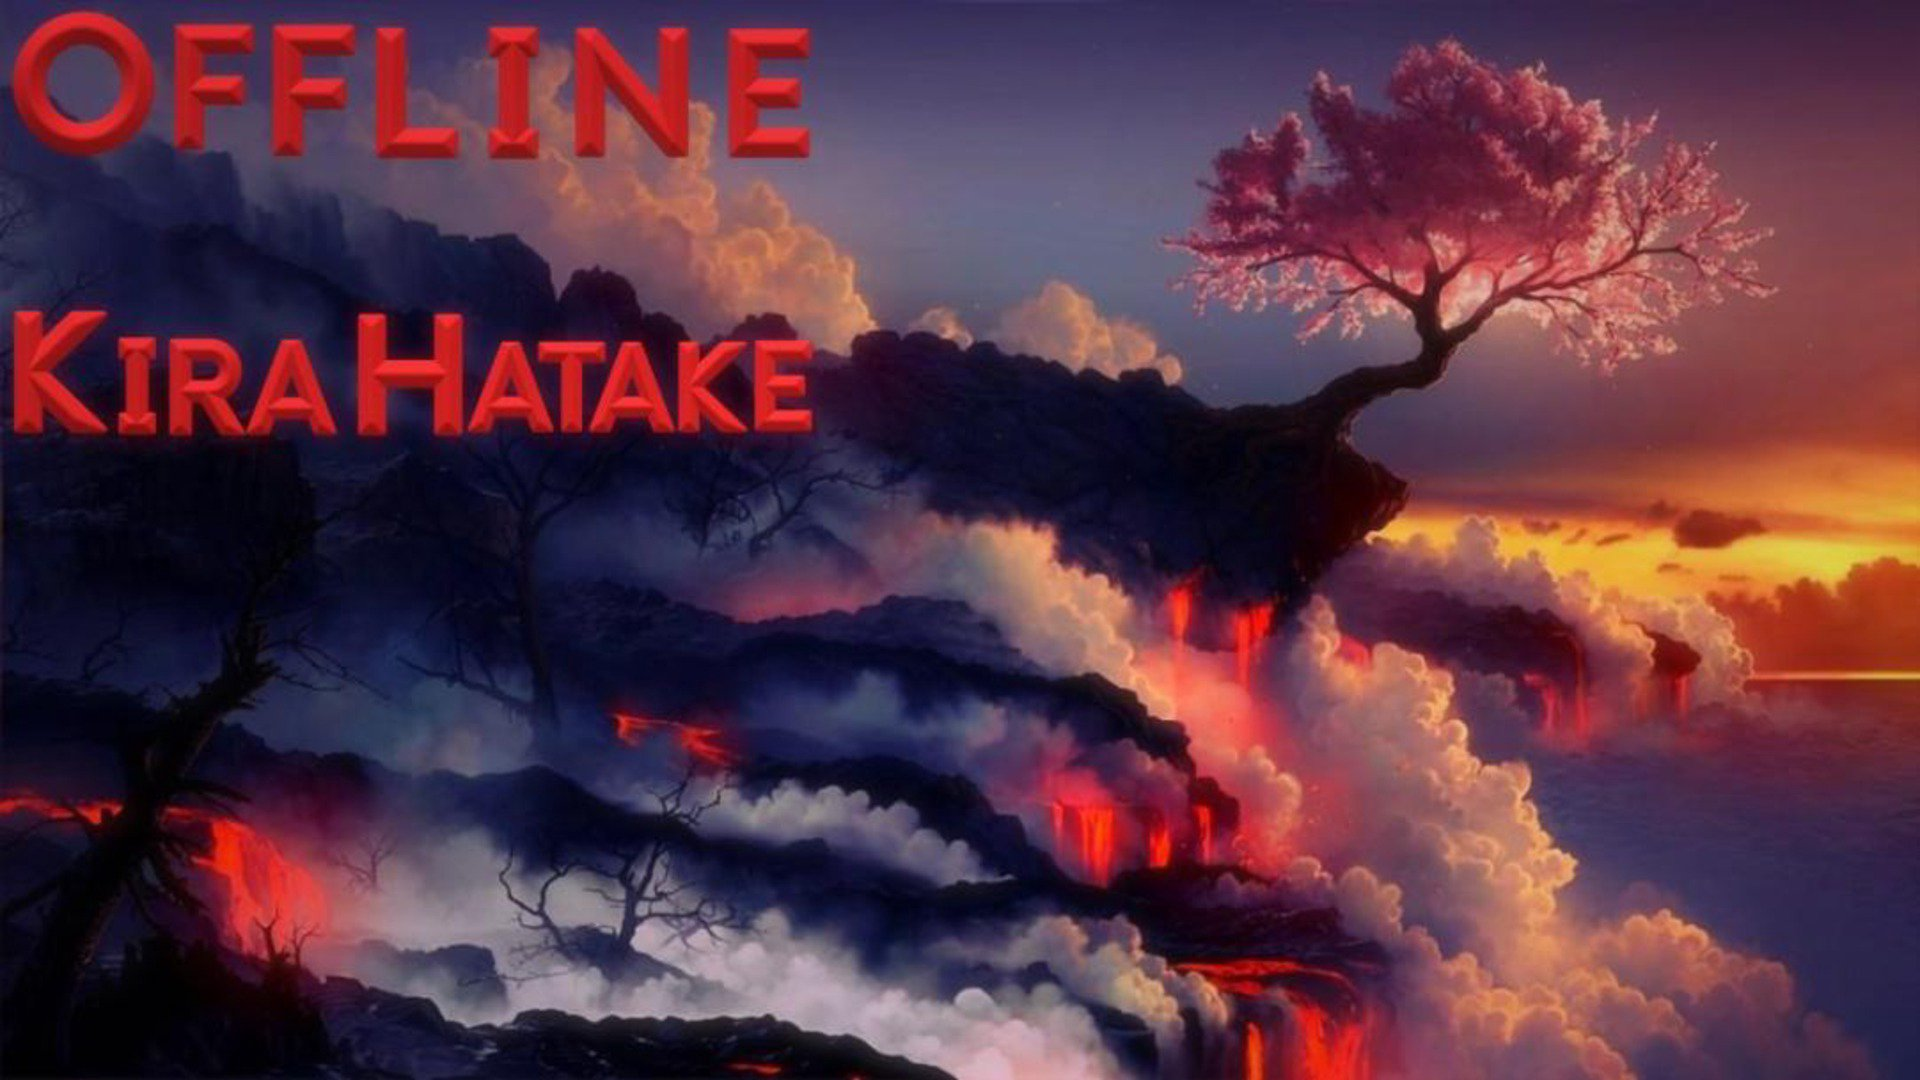 Twitch stream of KiraHatake